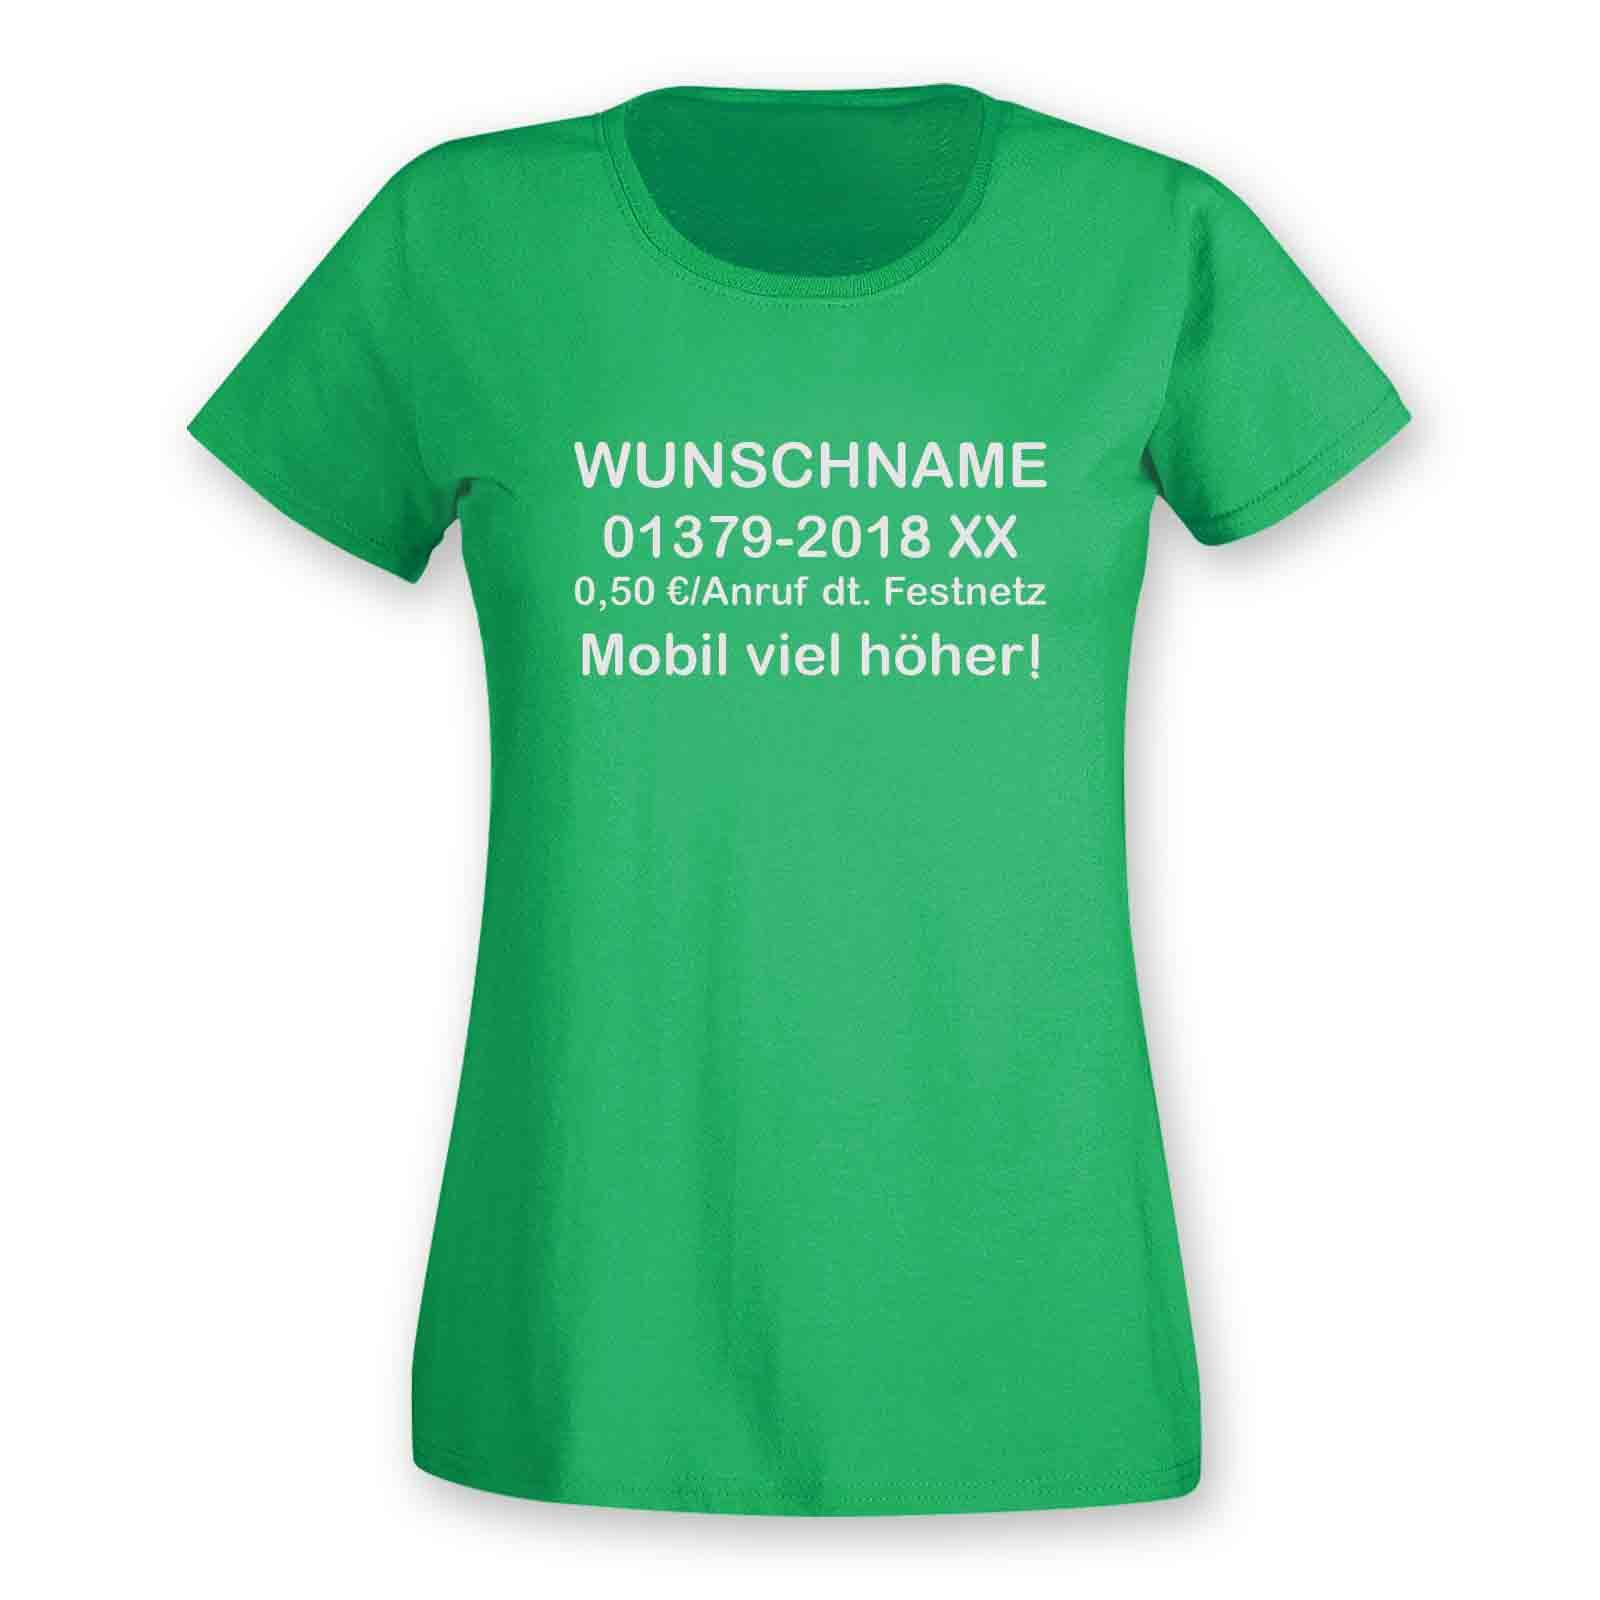 T Shirt Dschungelcamp Wunschname Telefonnummer Kostum Jga 15 Farben